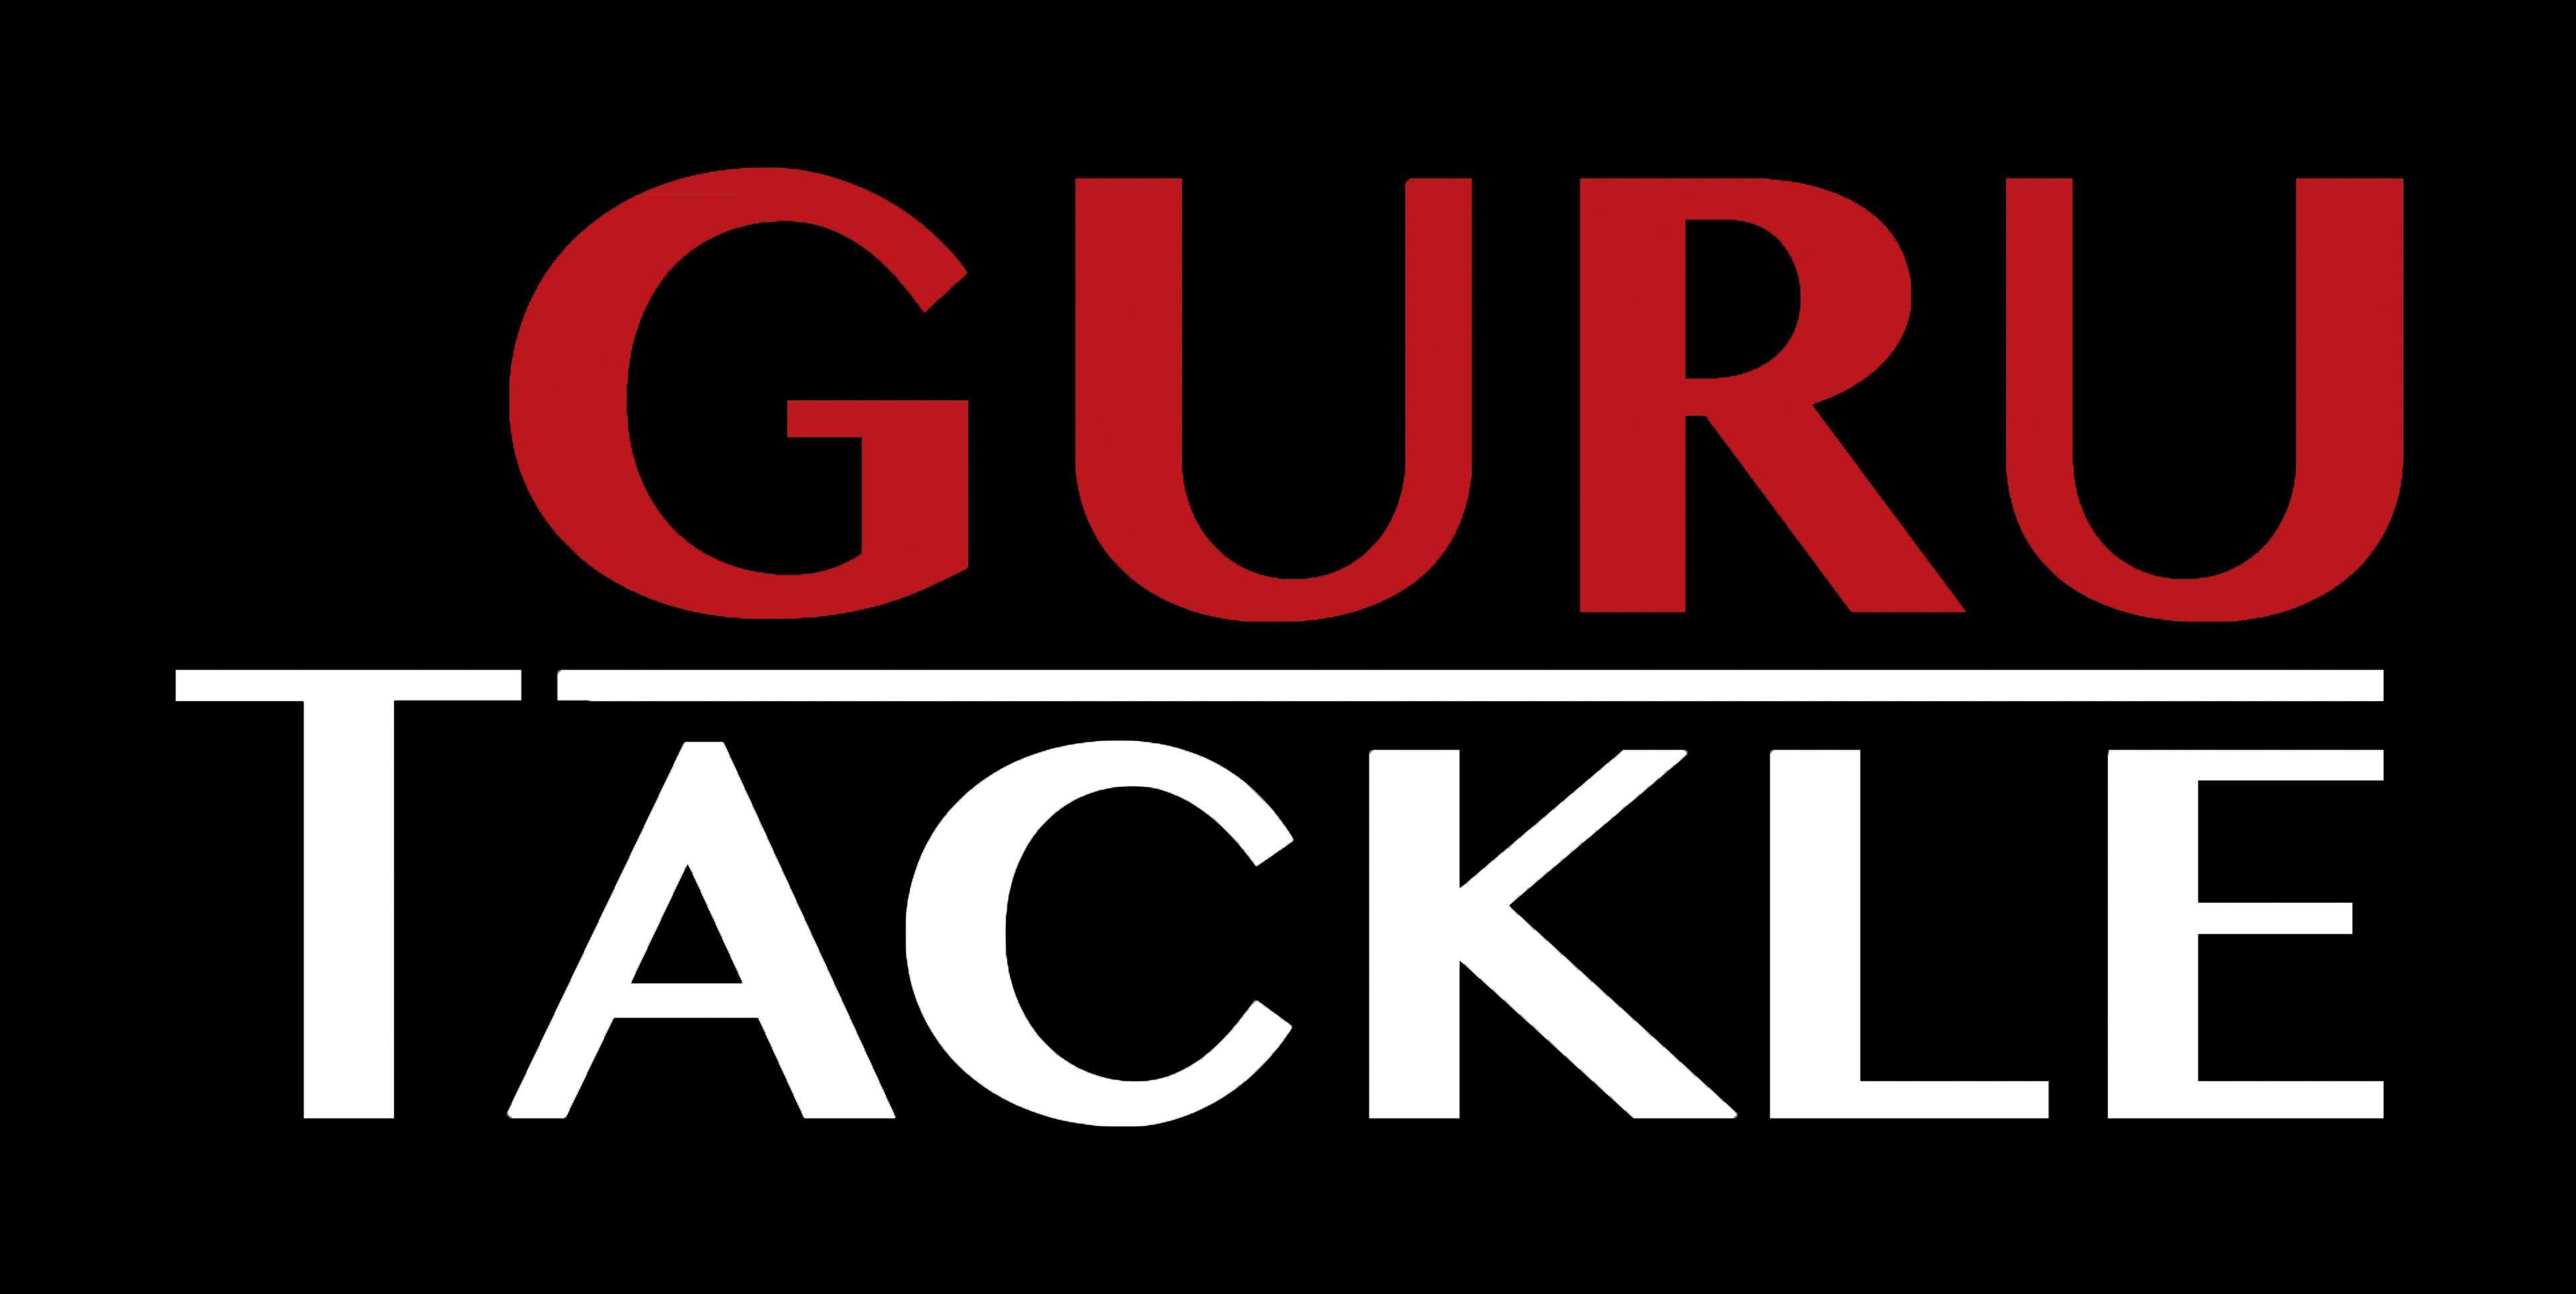 guru-tackle-blk-logo